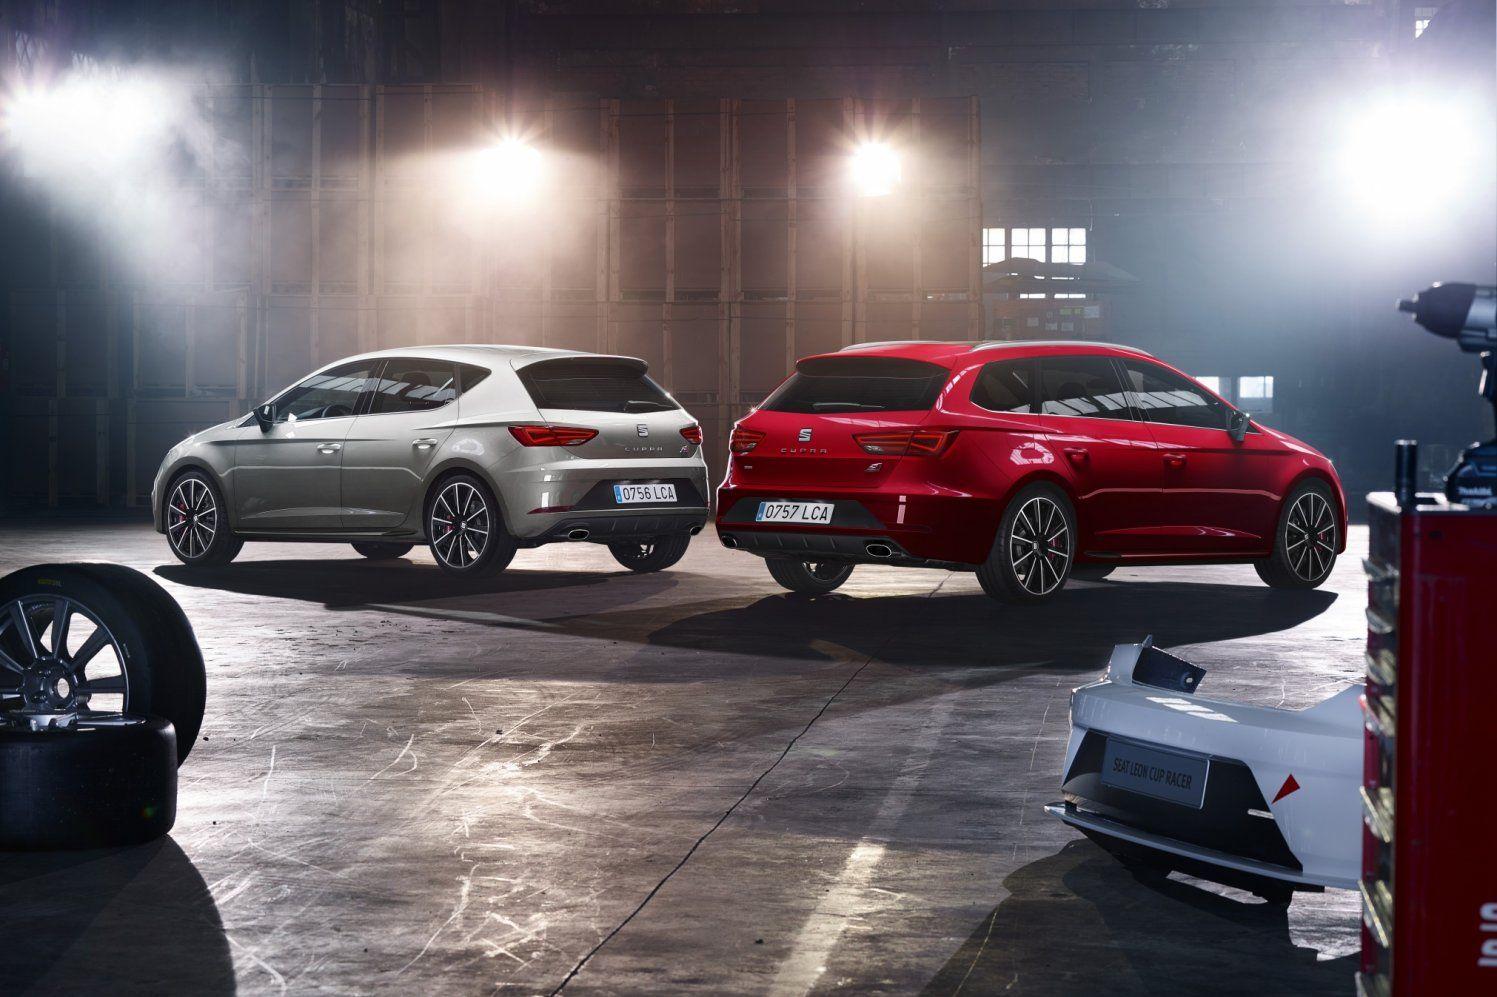 Dikste vernieuwde Seat Leon Cupra kost 51.200,- euro als familieauto